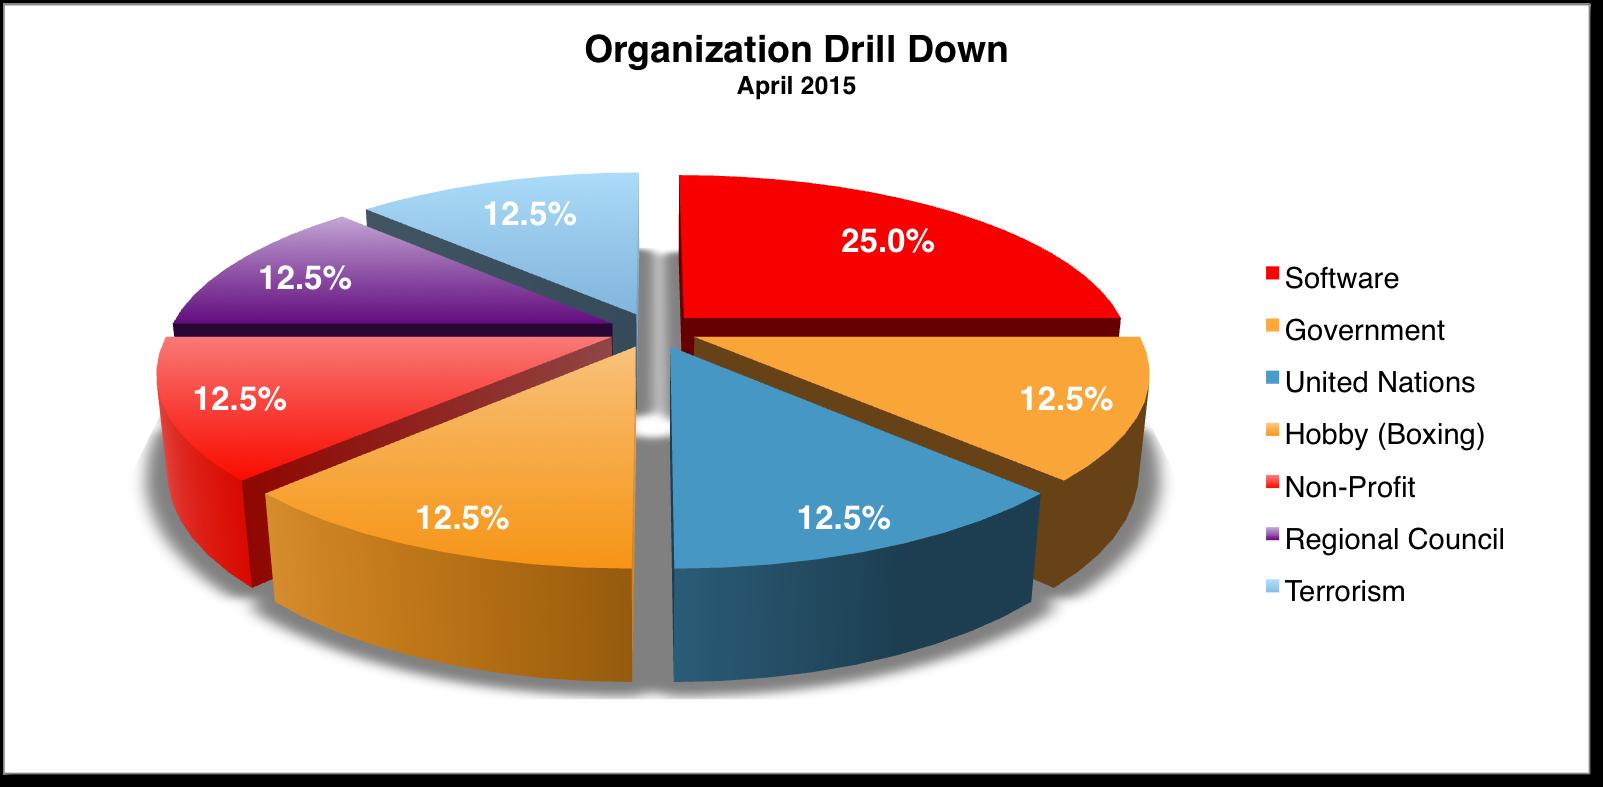 Org Drill Down April 2015